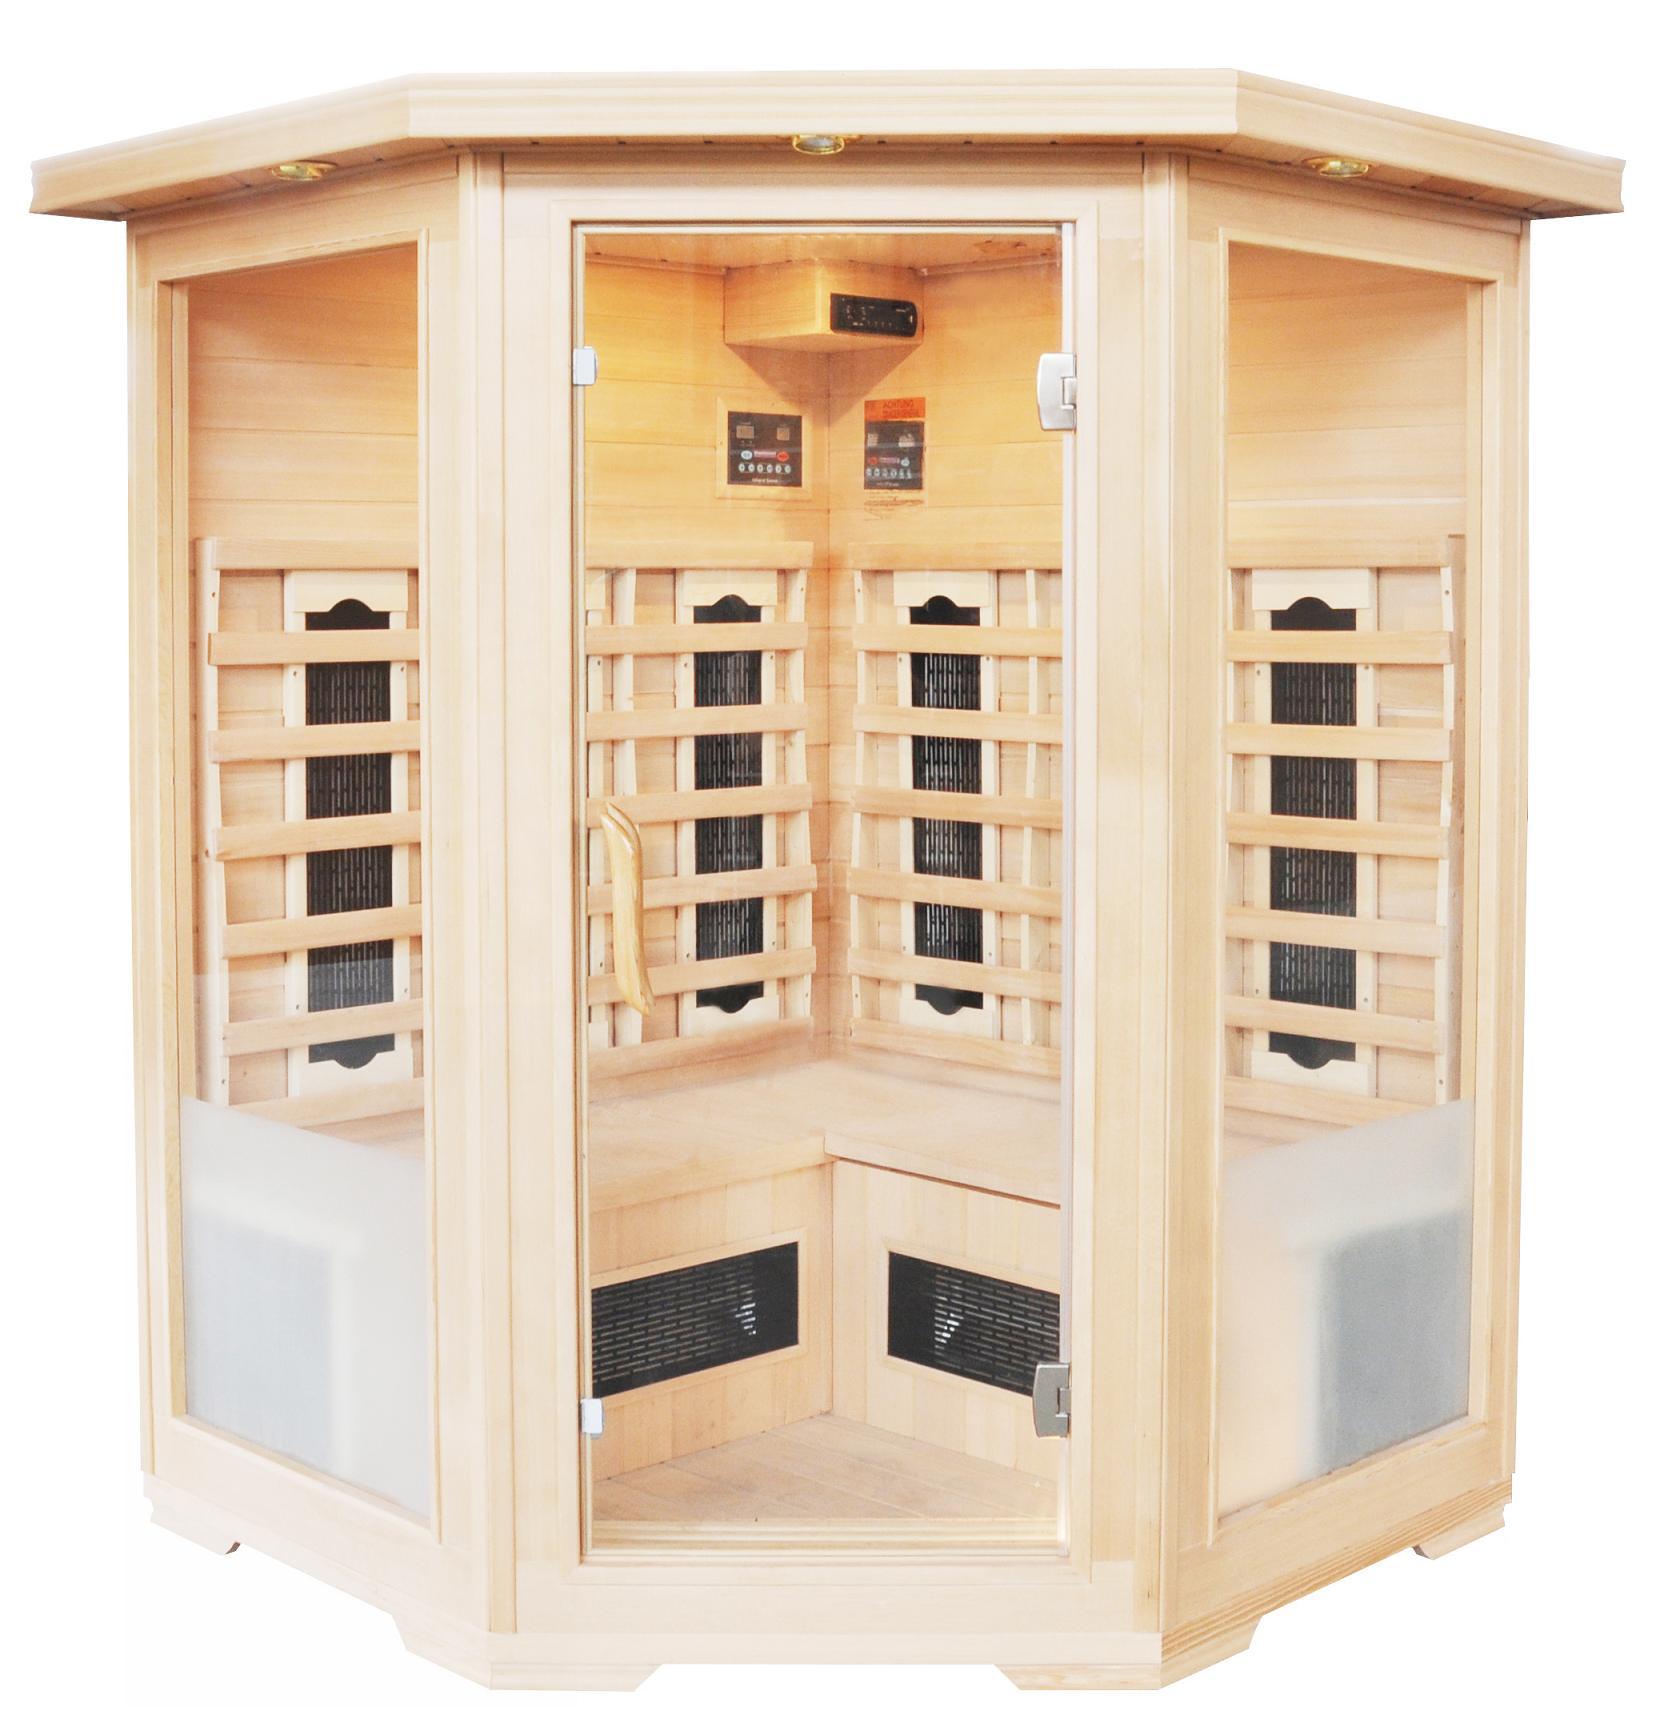 infrarotkabine dreamsauna24 w rmekabine g nstige. Black Bedroom Furniture Sets. Home Design Ideas